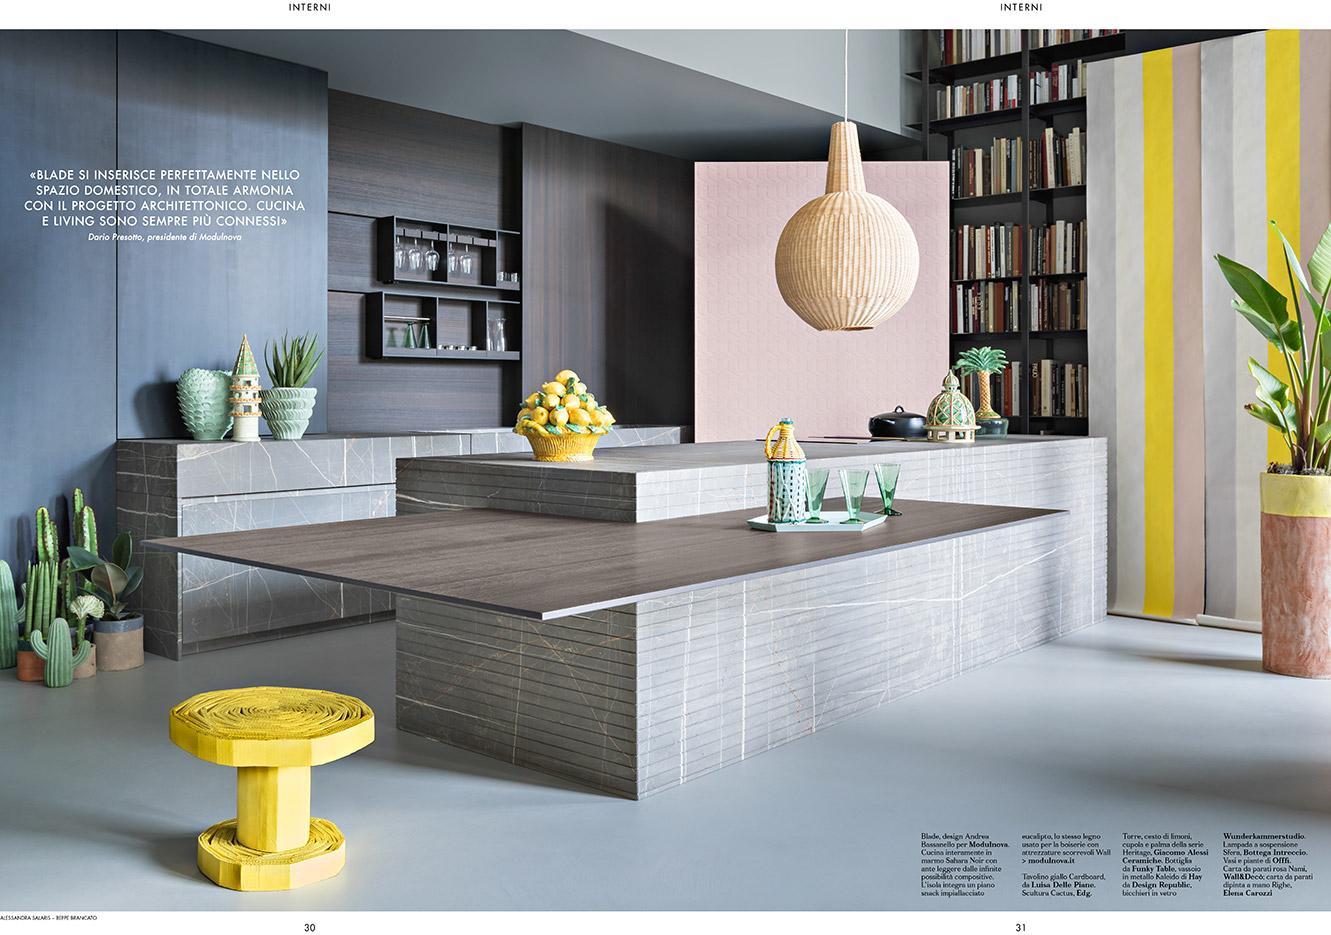 Living Kitchen Design, La Cucina è Social